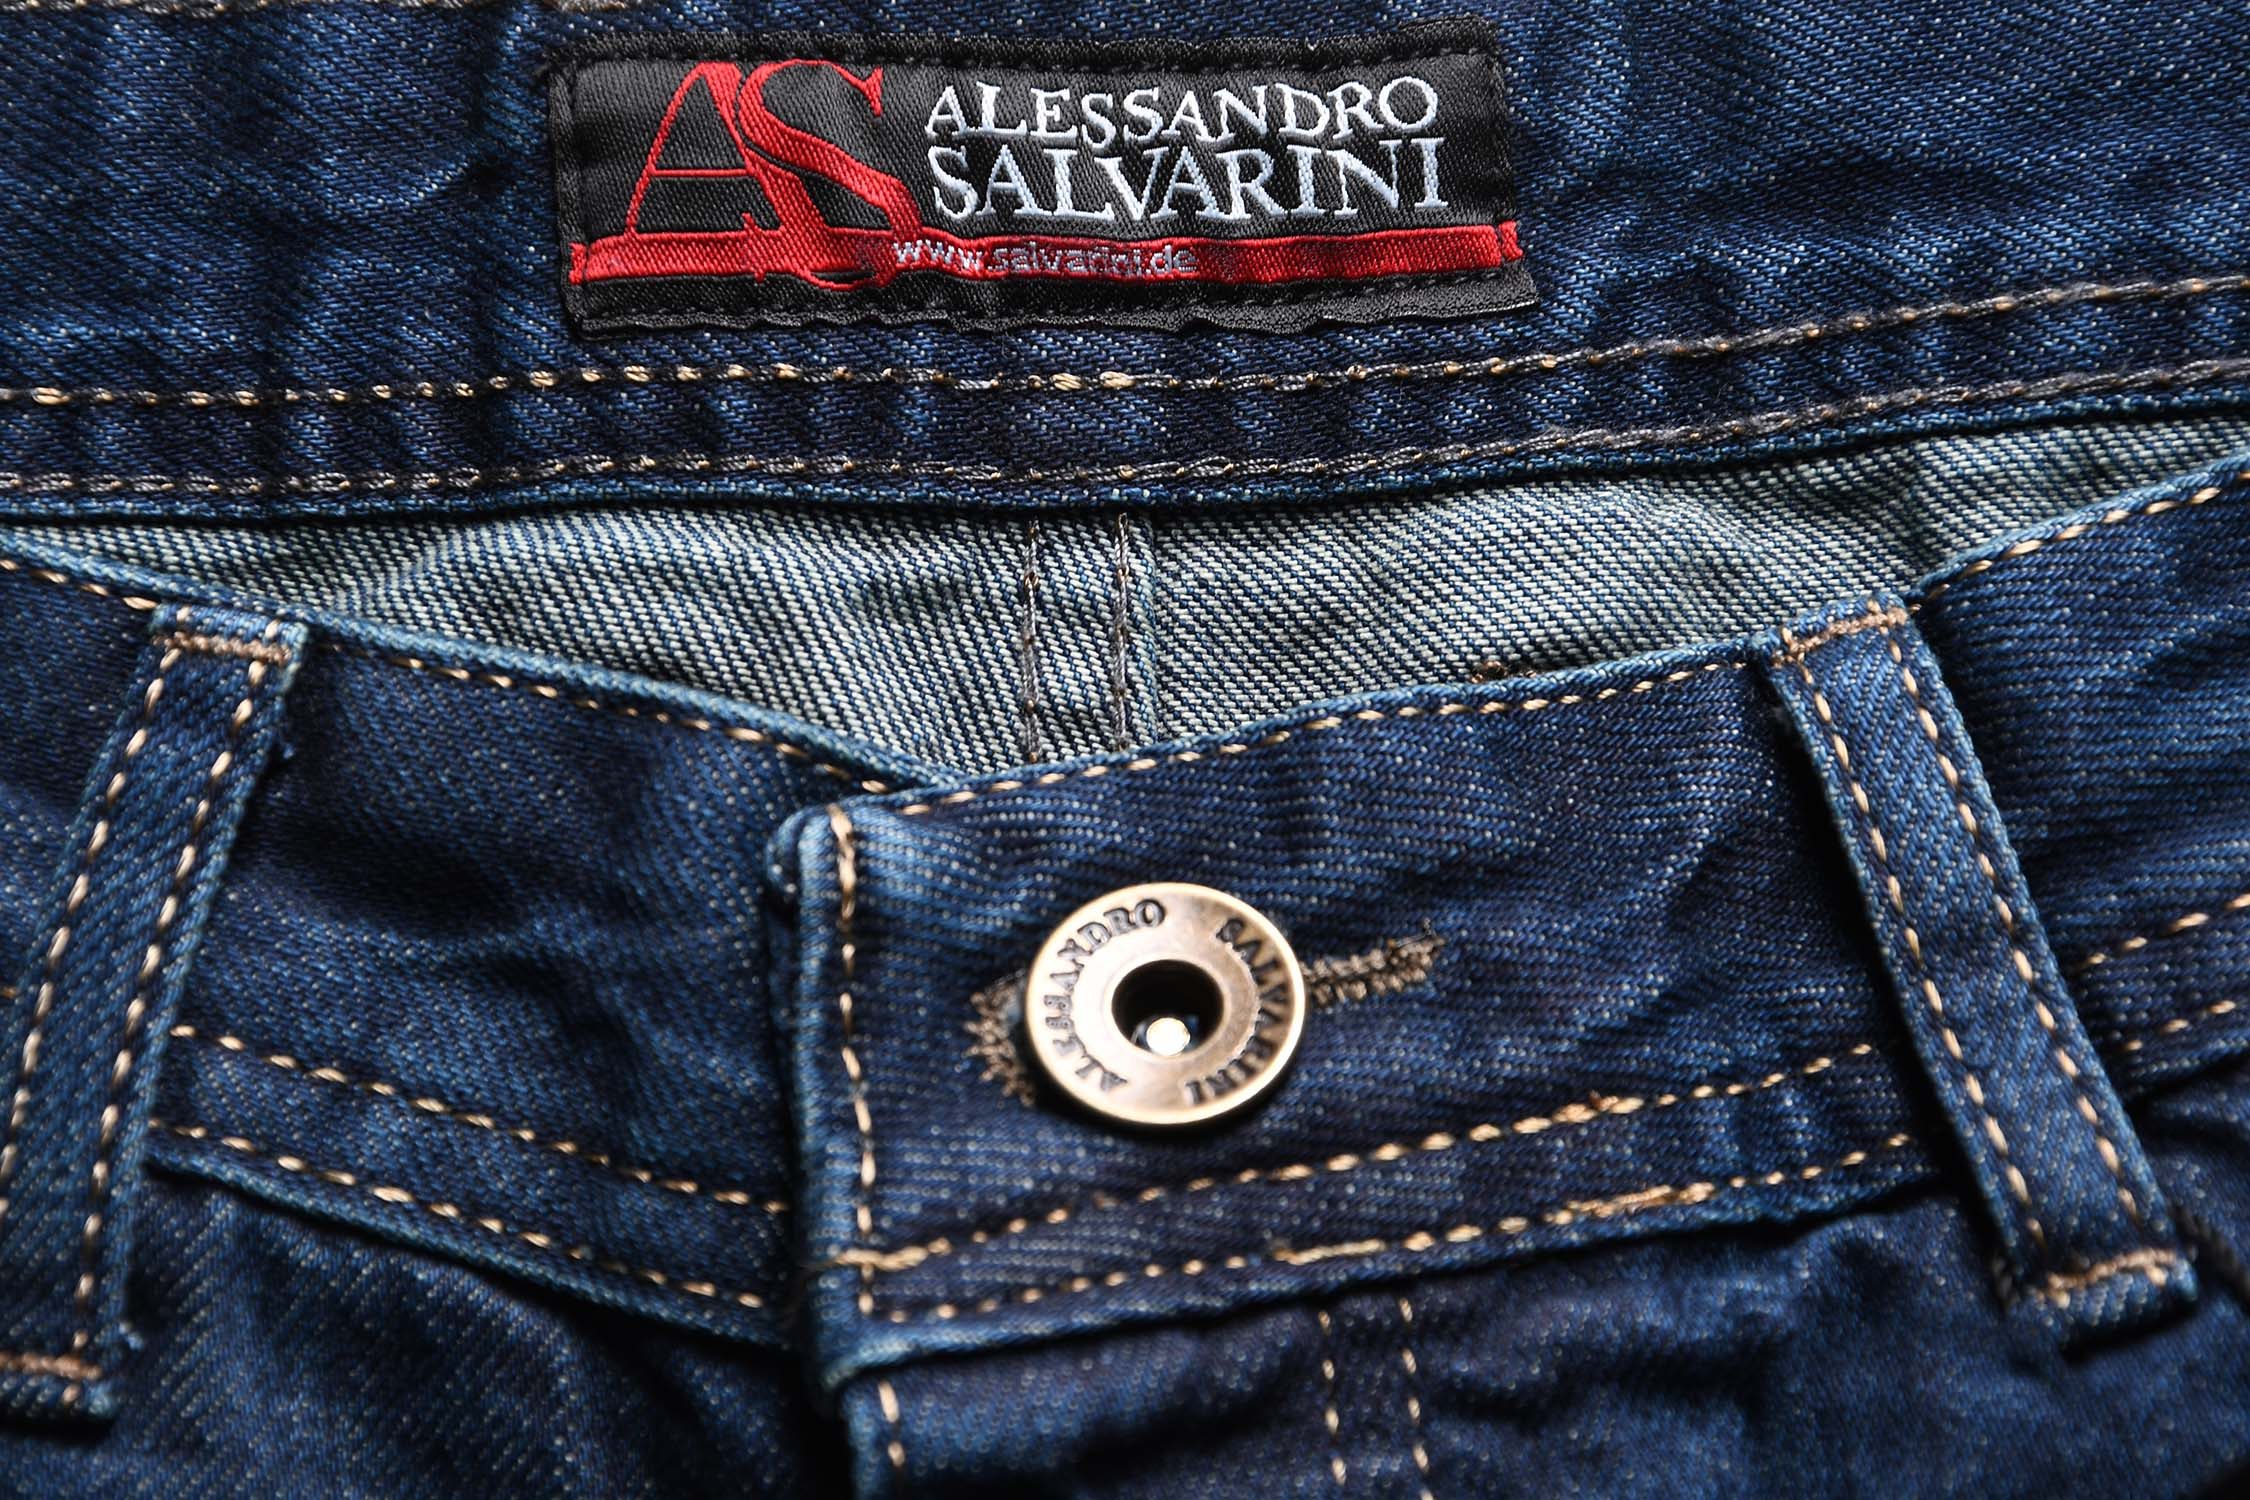 A-Salvarini-Beppo-Designer-Herren-Jeans-Hose-Basic-Jeanshose-Comfort-Fit Indexbild 16